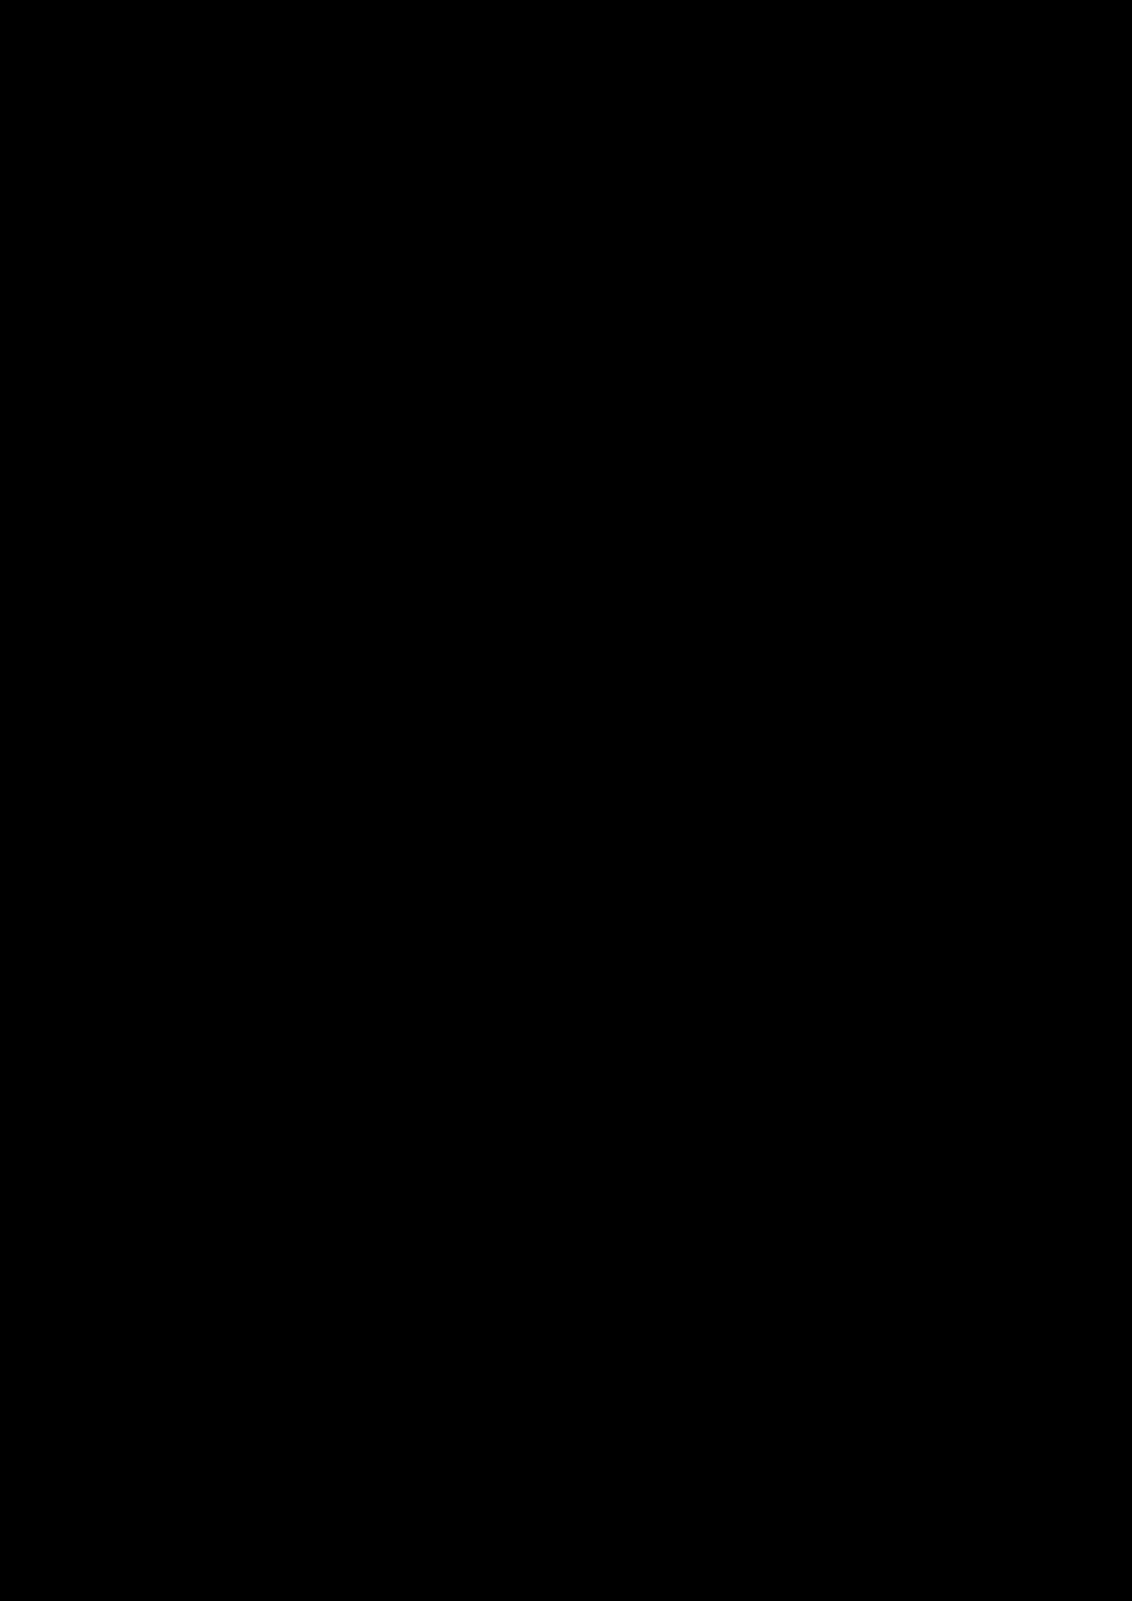 N.A.S.T.YA slide, Image 32